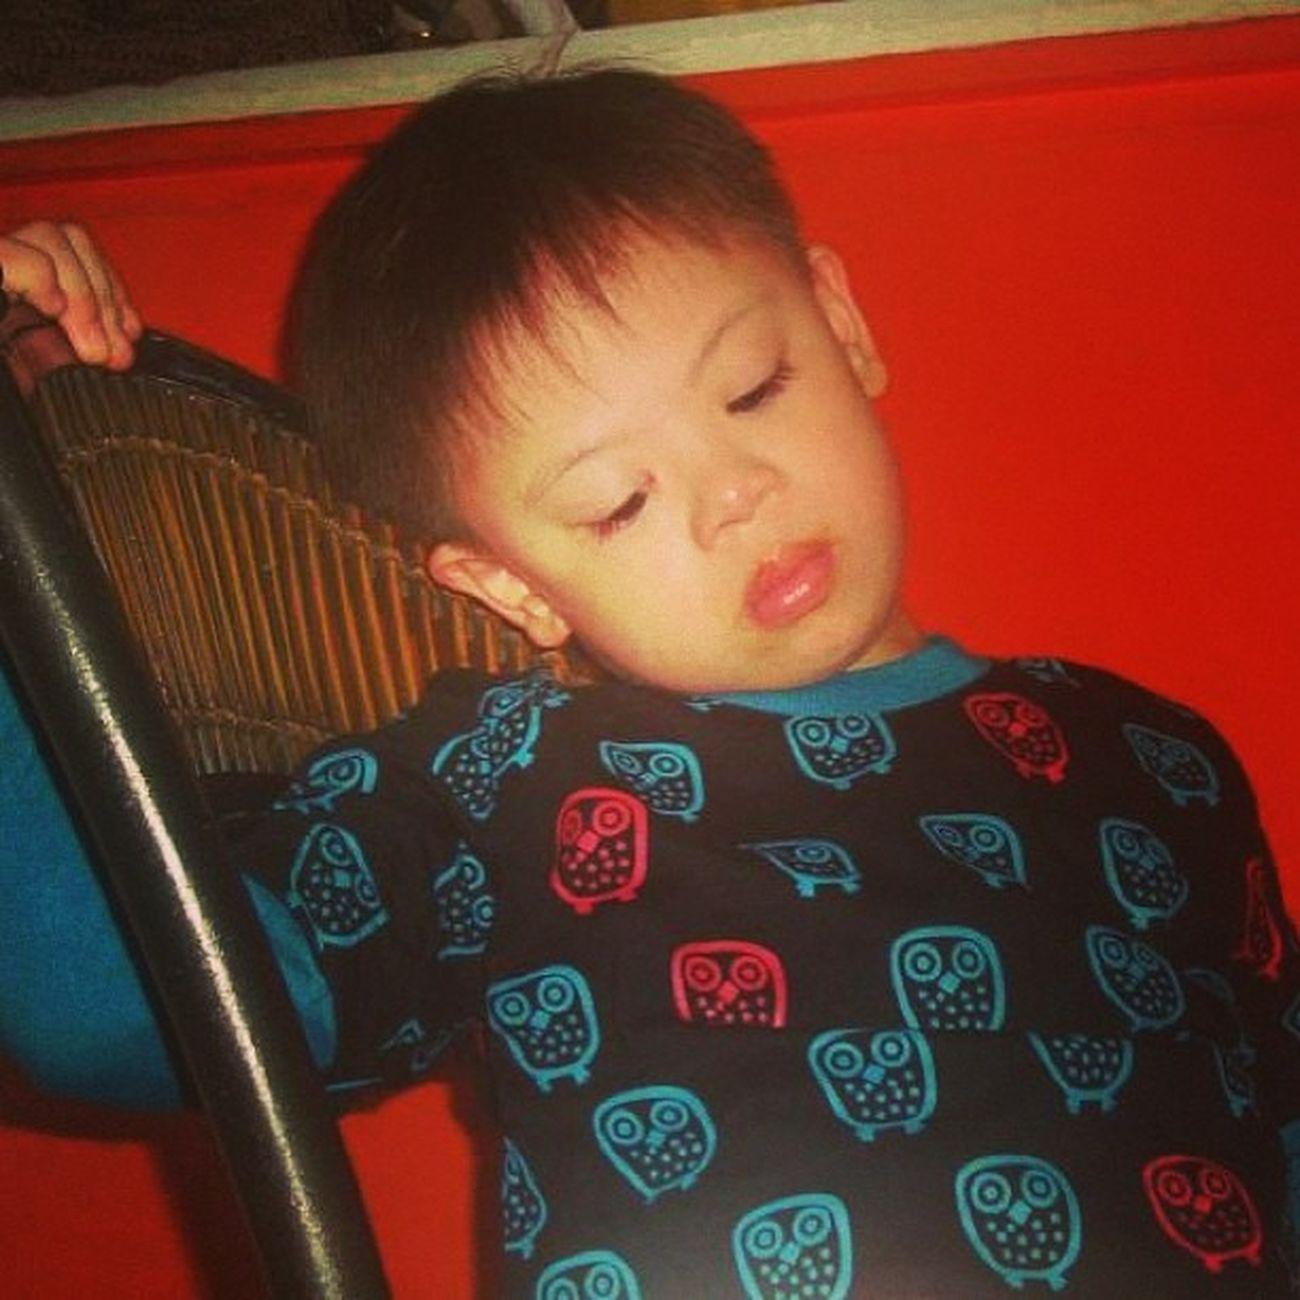 I miss bullying this litol boy. :( Homesick  Nephewlove